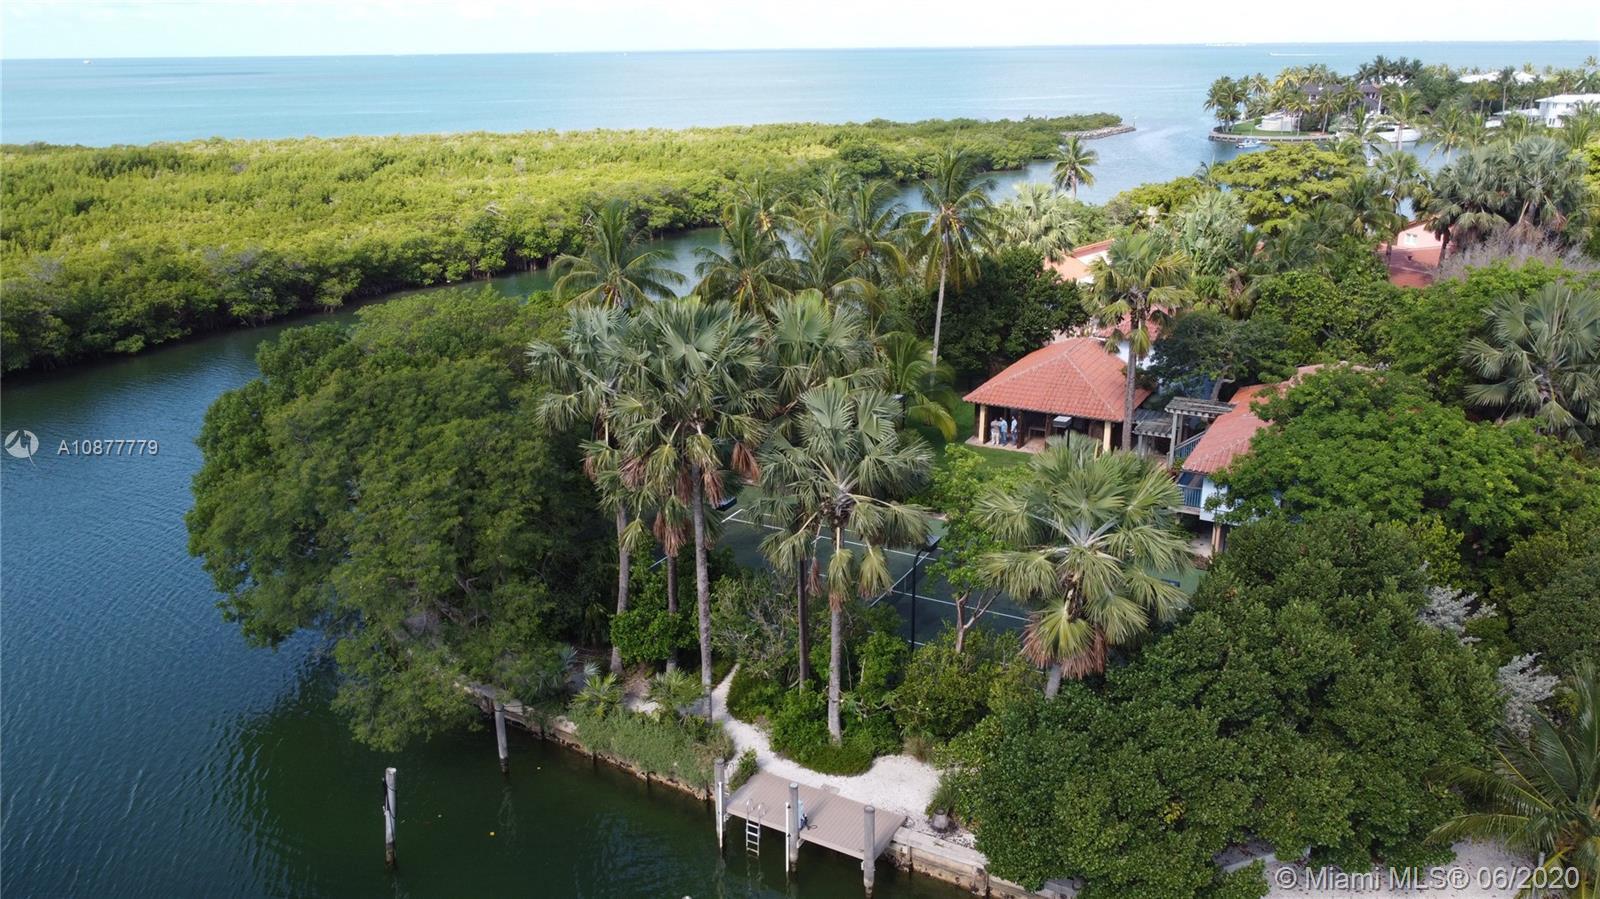 image #1 of property, Cape Florida Sub Sec 1